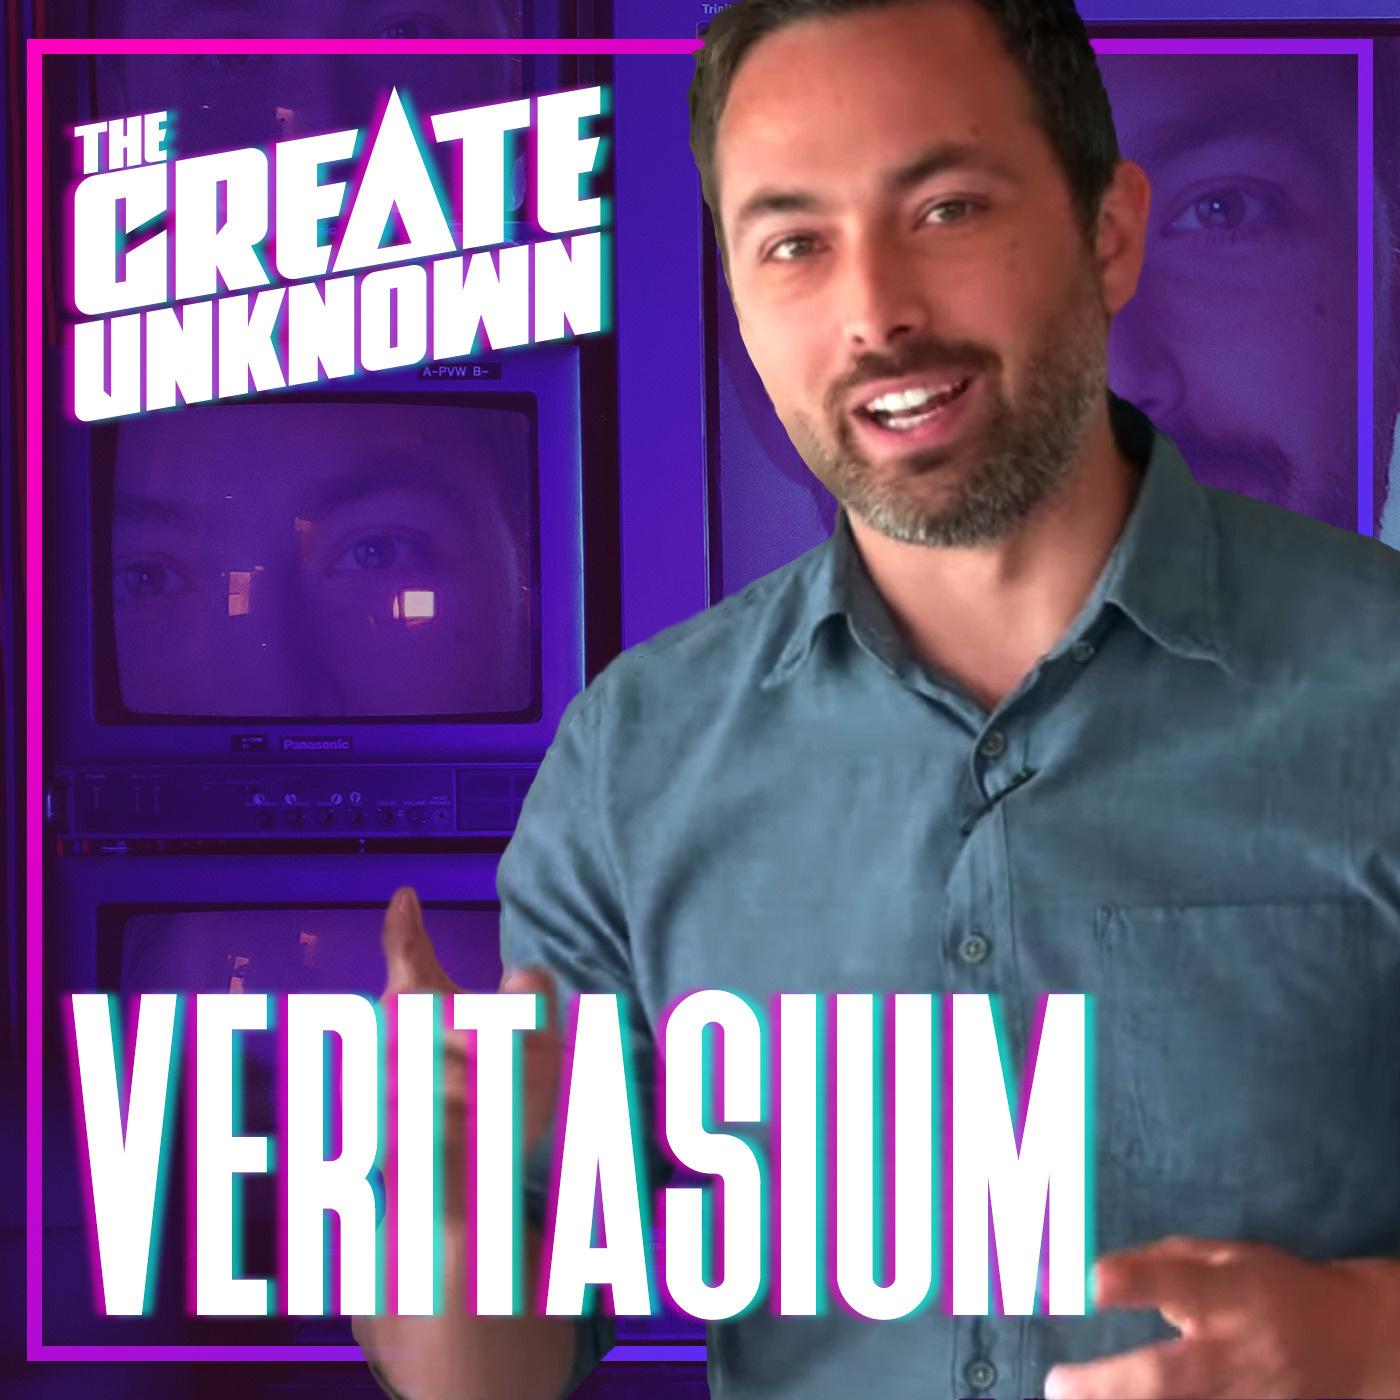 """How I Got 30,000,000 Views"" with Veritasium"